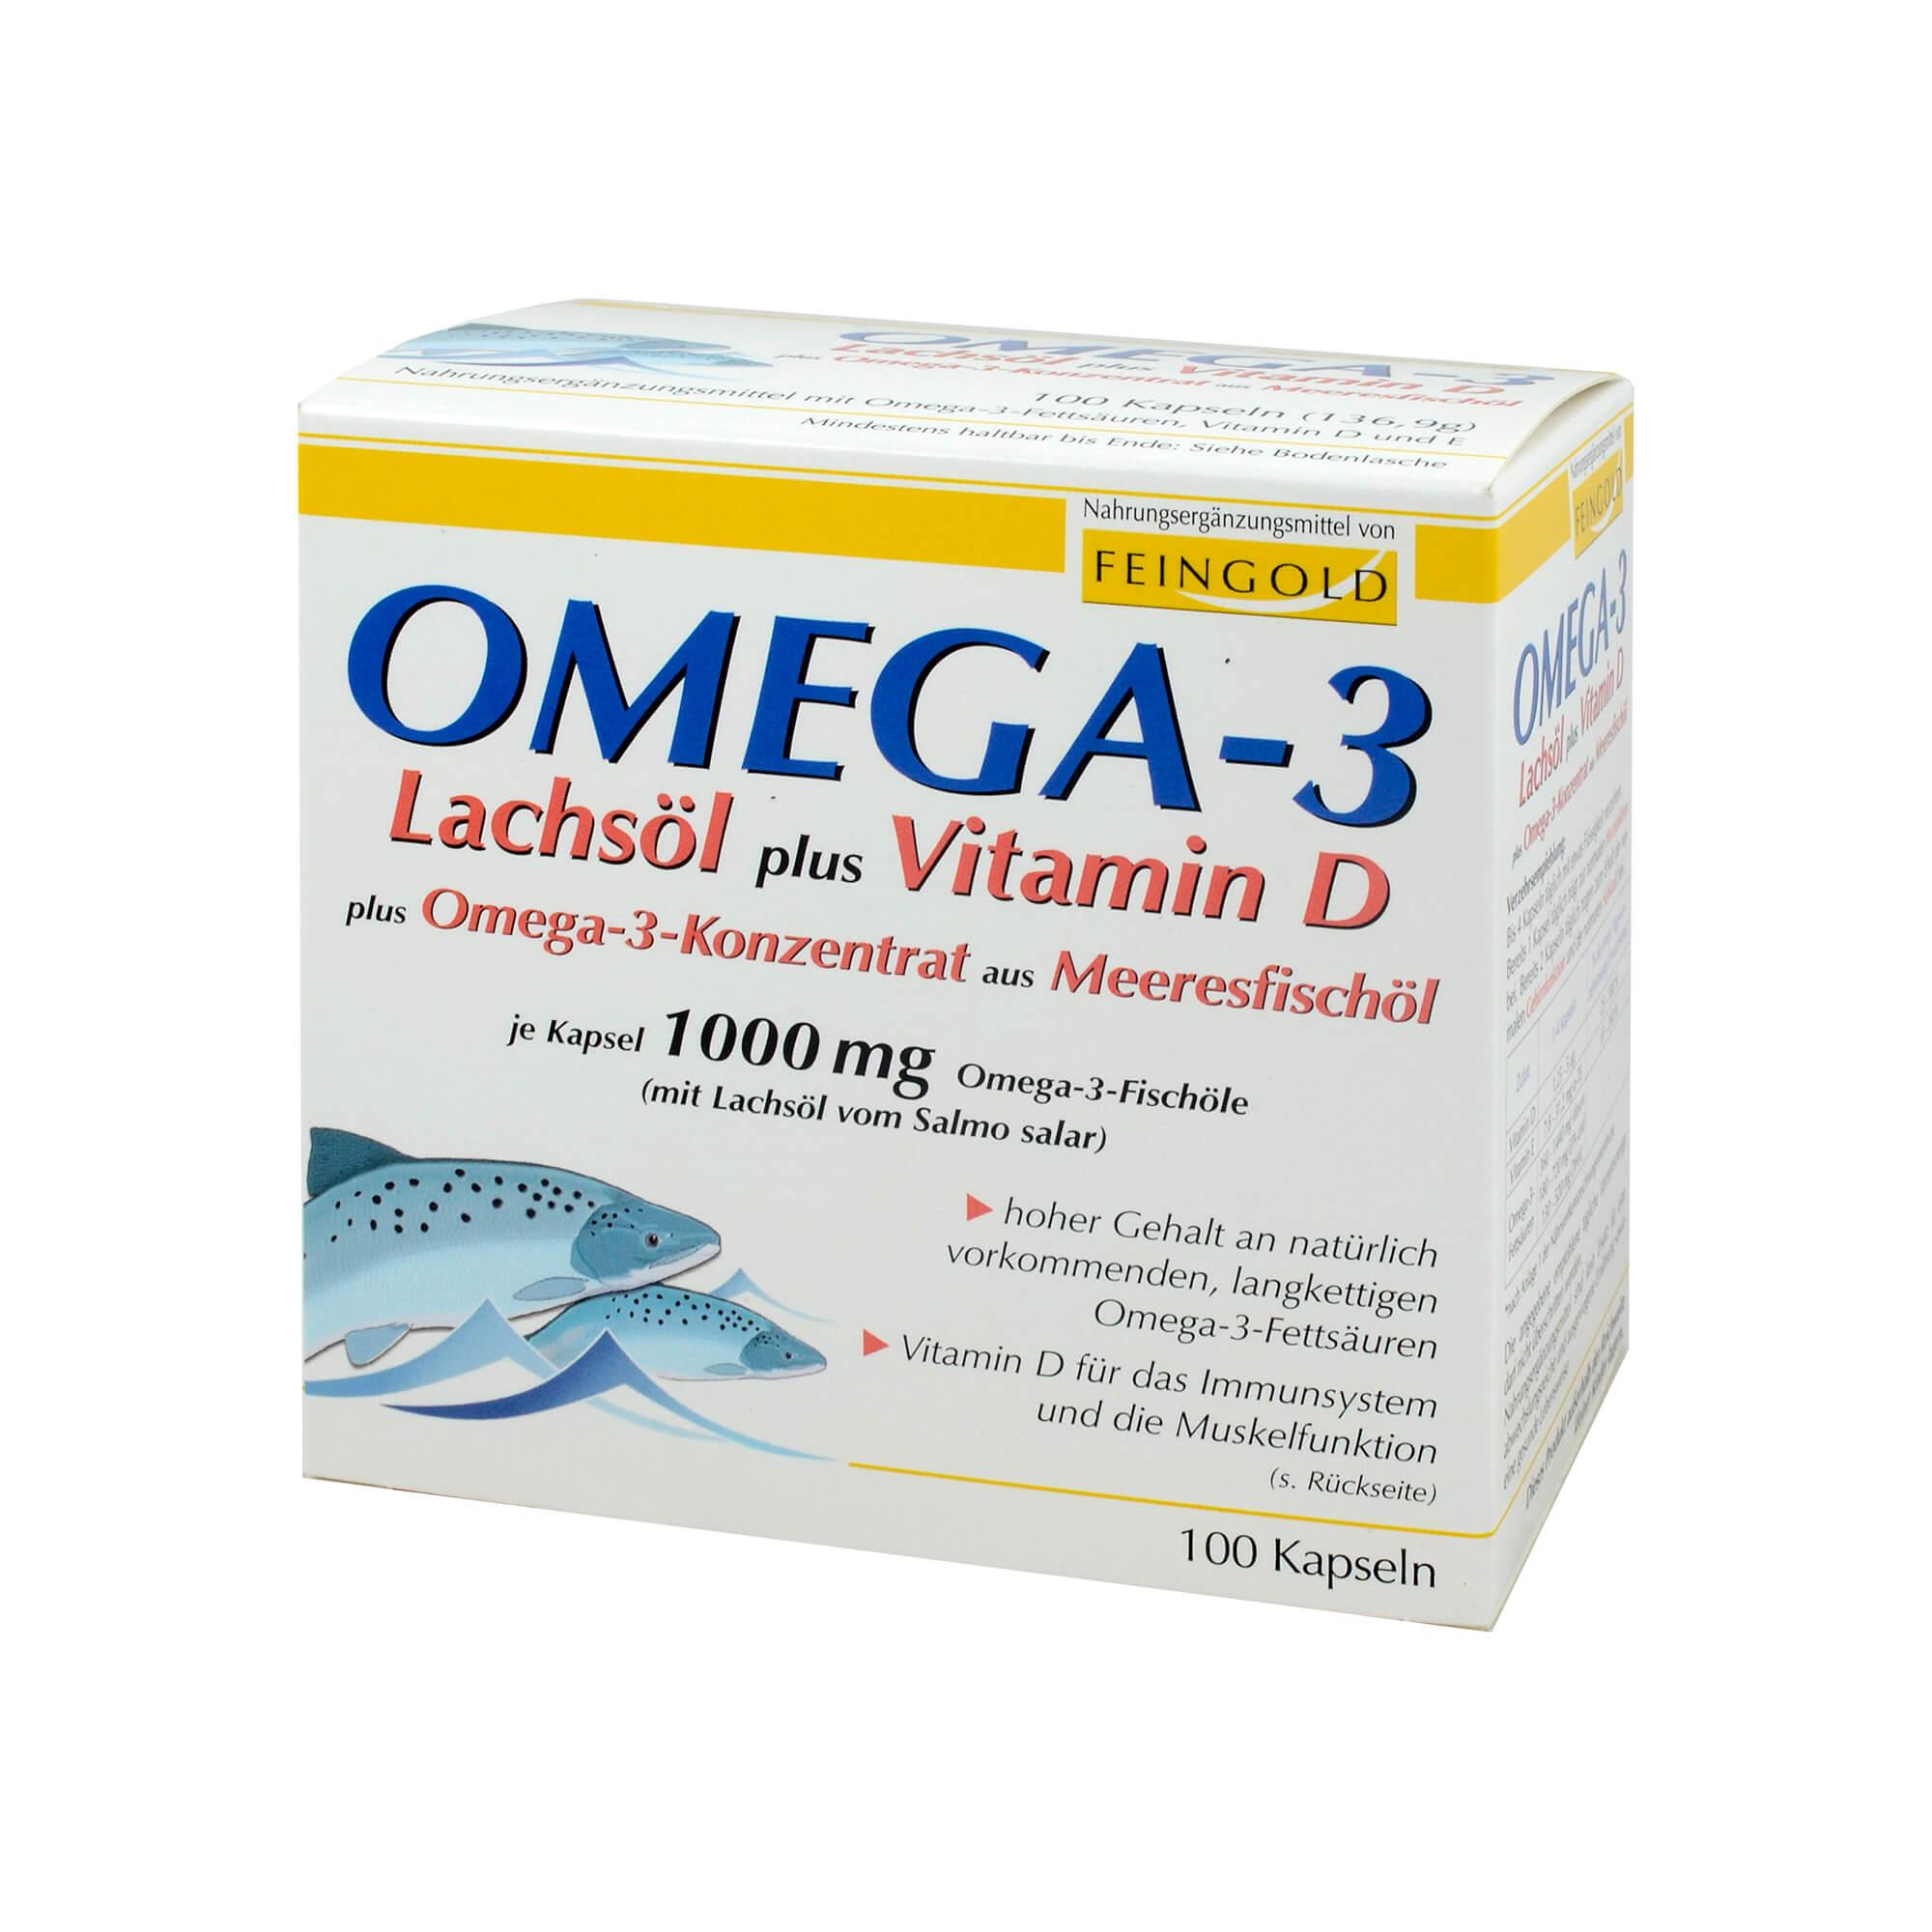 Omega 3 Lachsöl Plus Vit. D Plus Omega3 Konz. Kps.